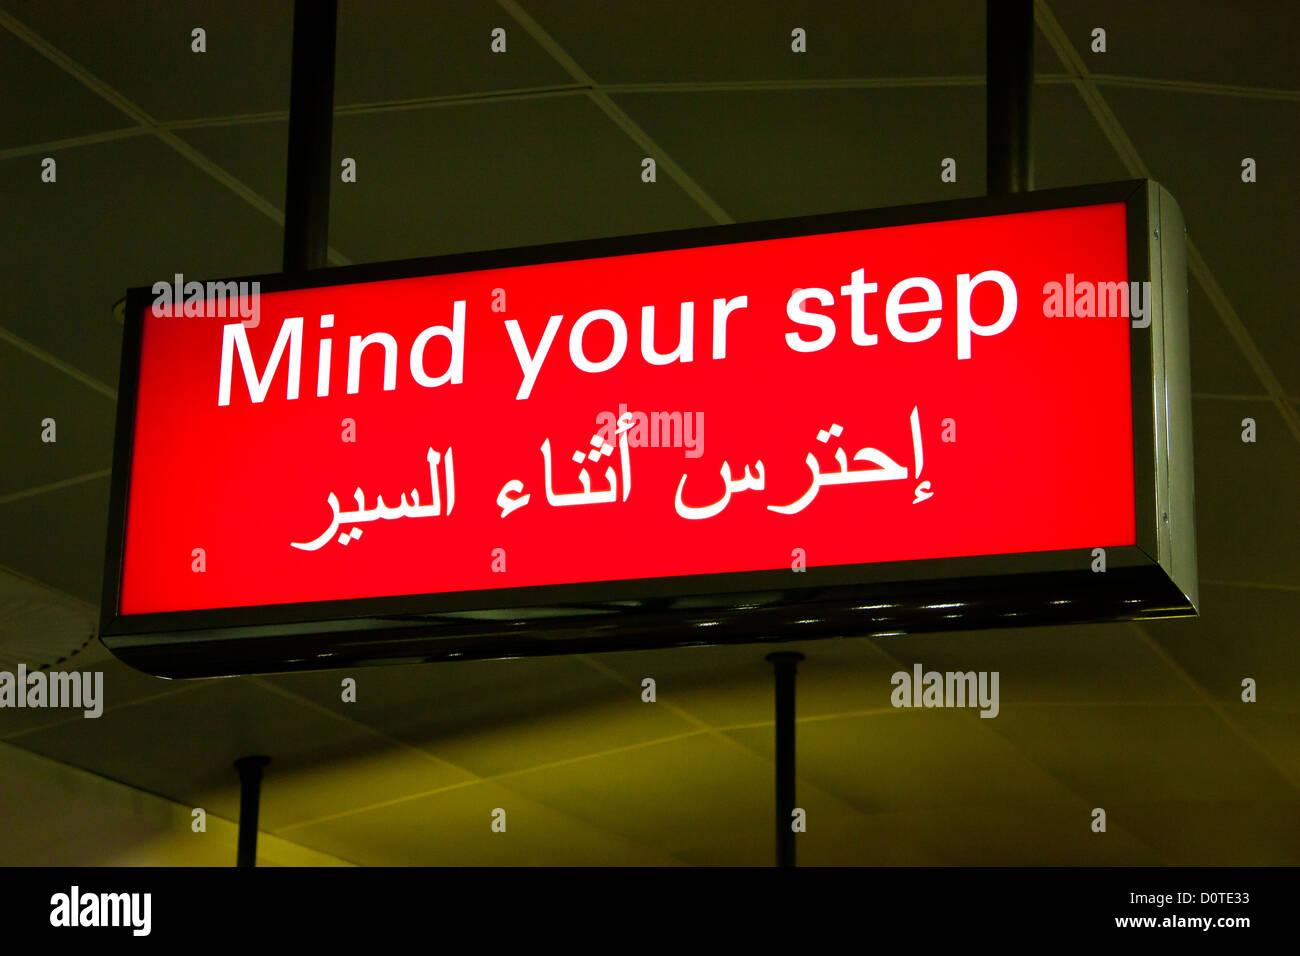 Arabian Step